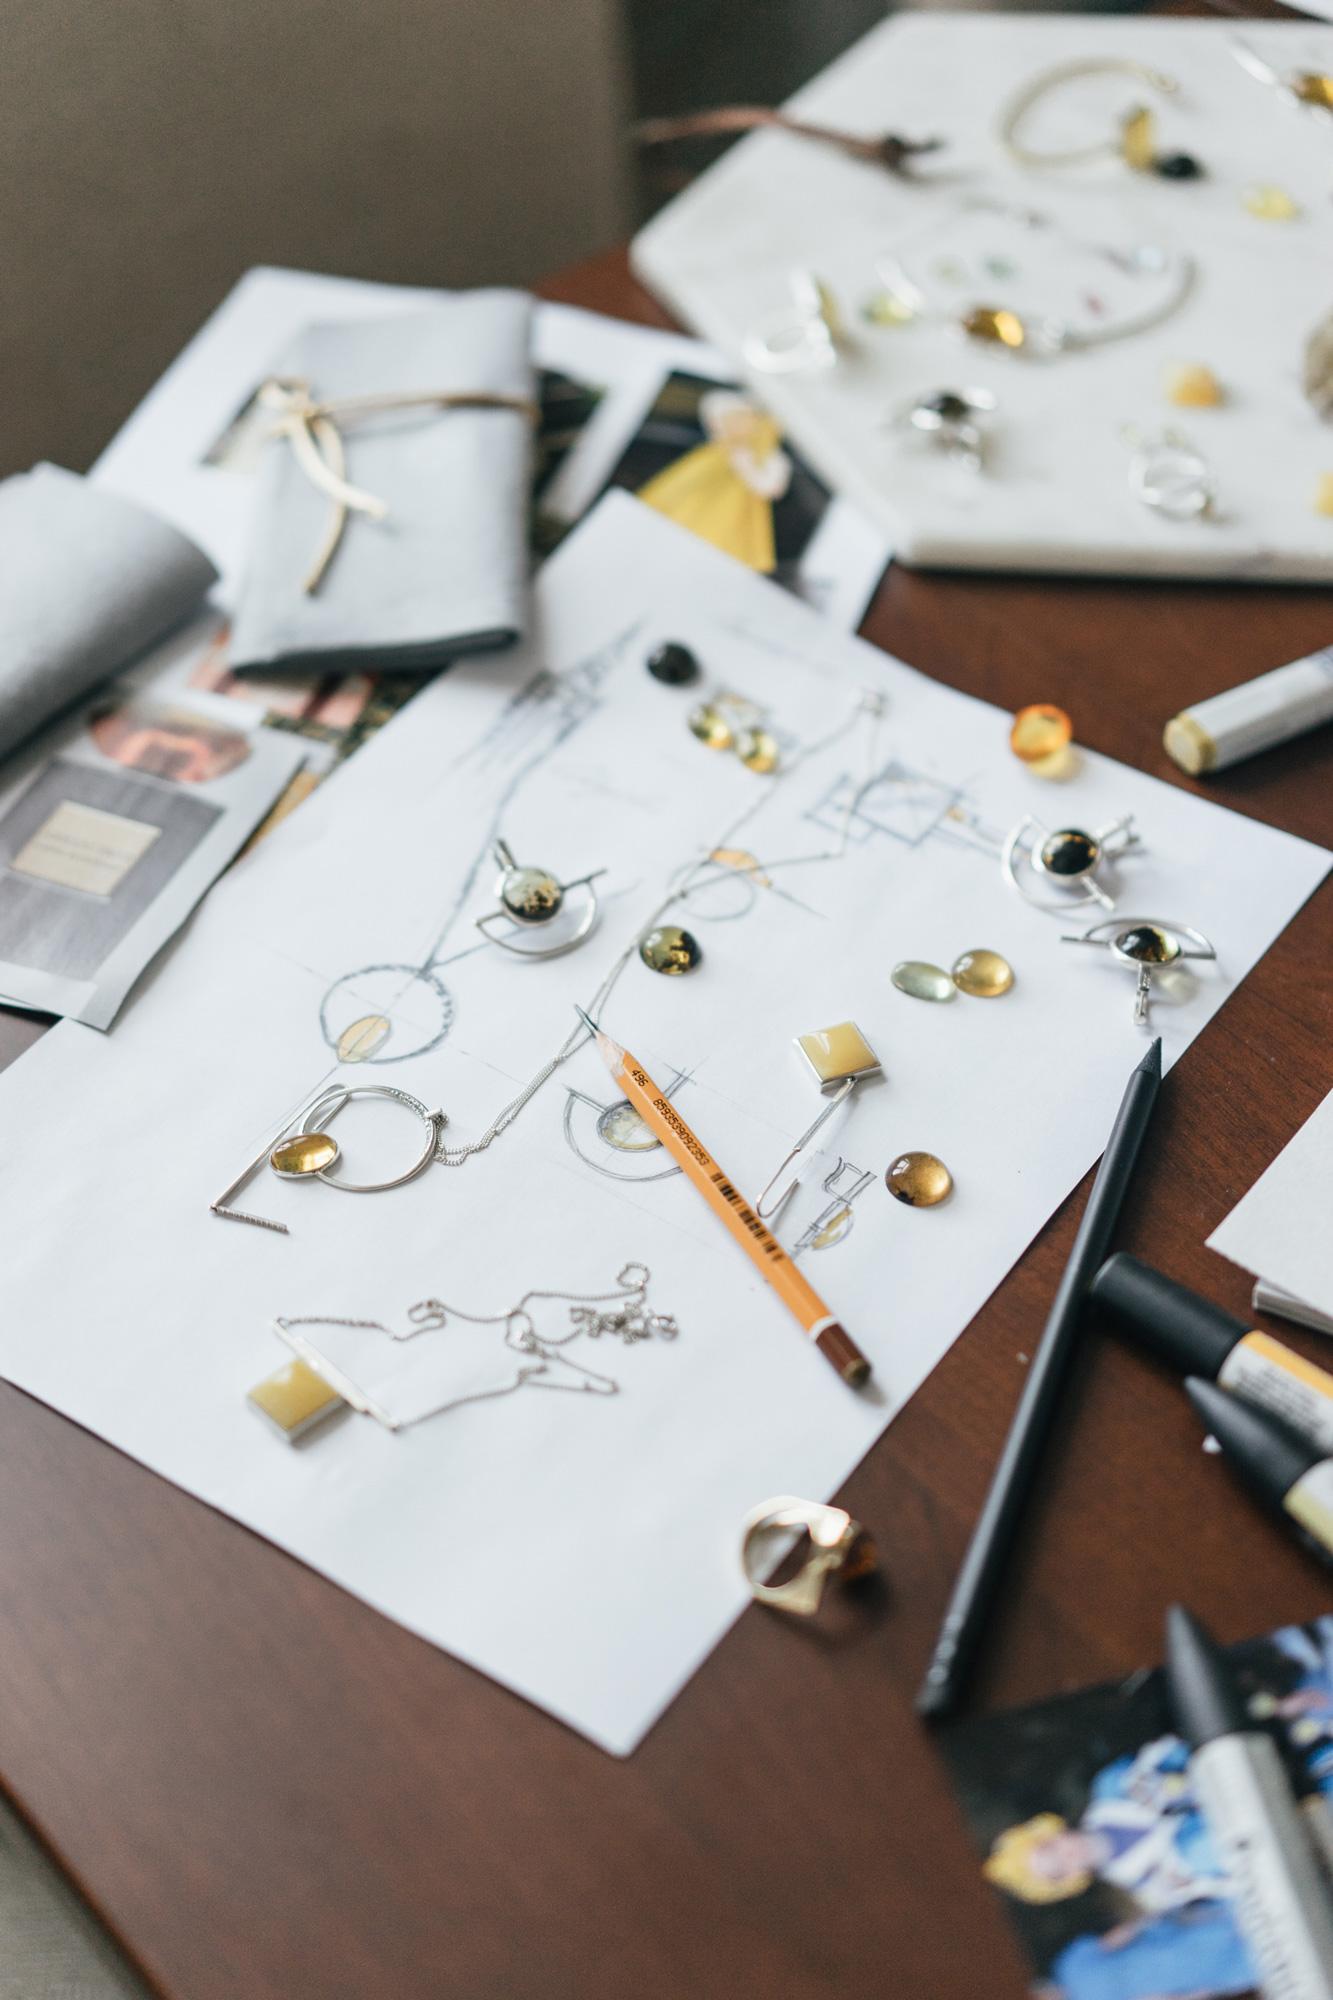 Moodboard and Sketching